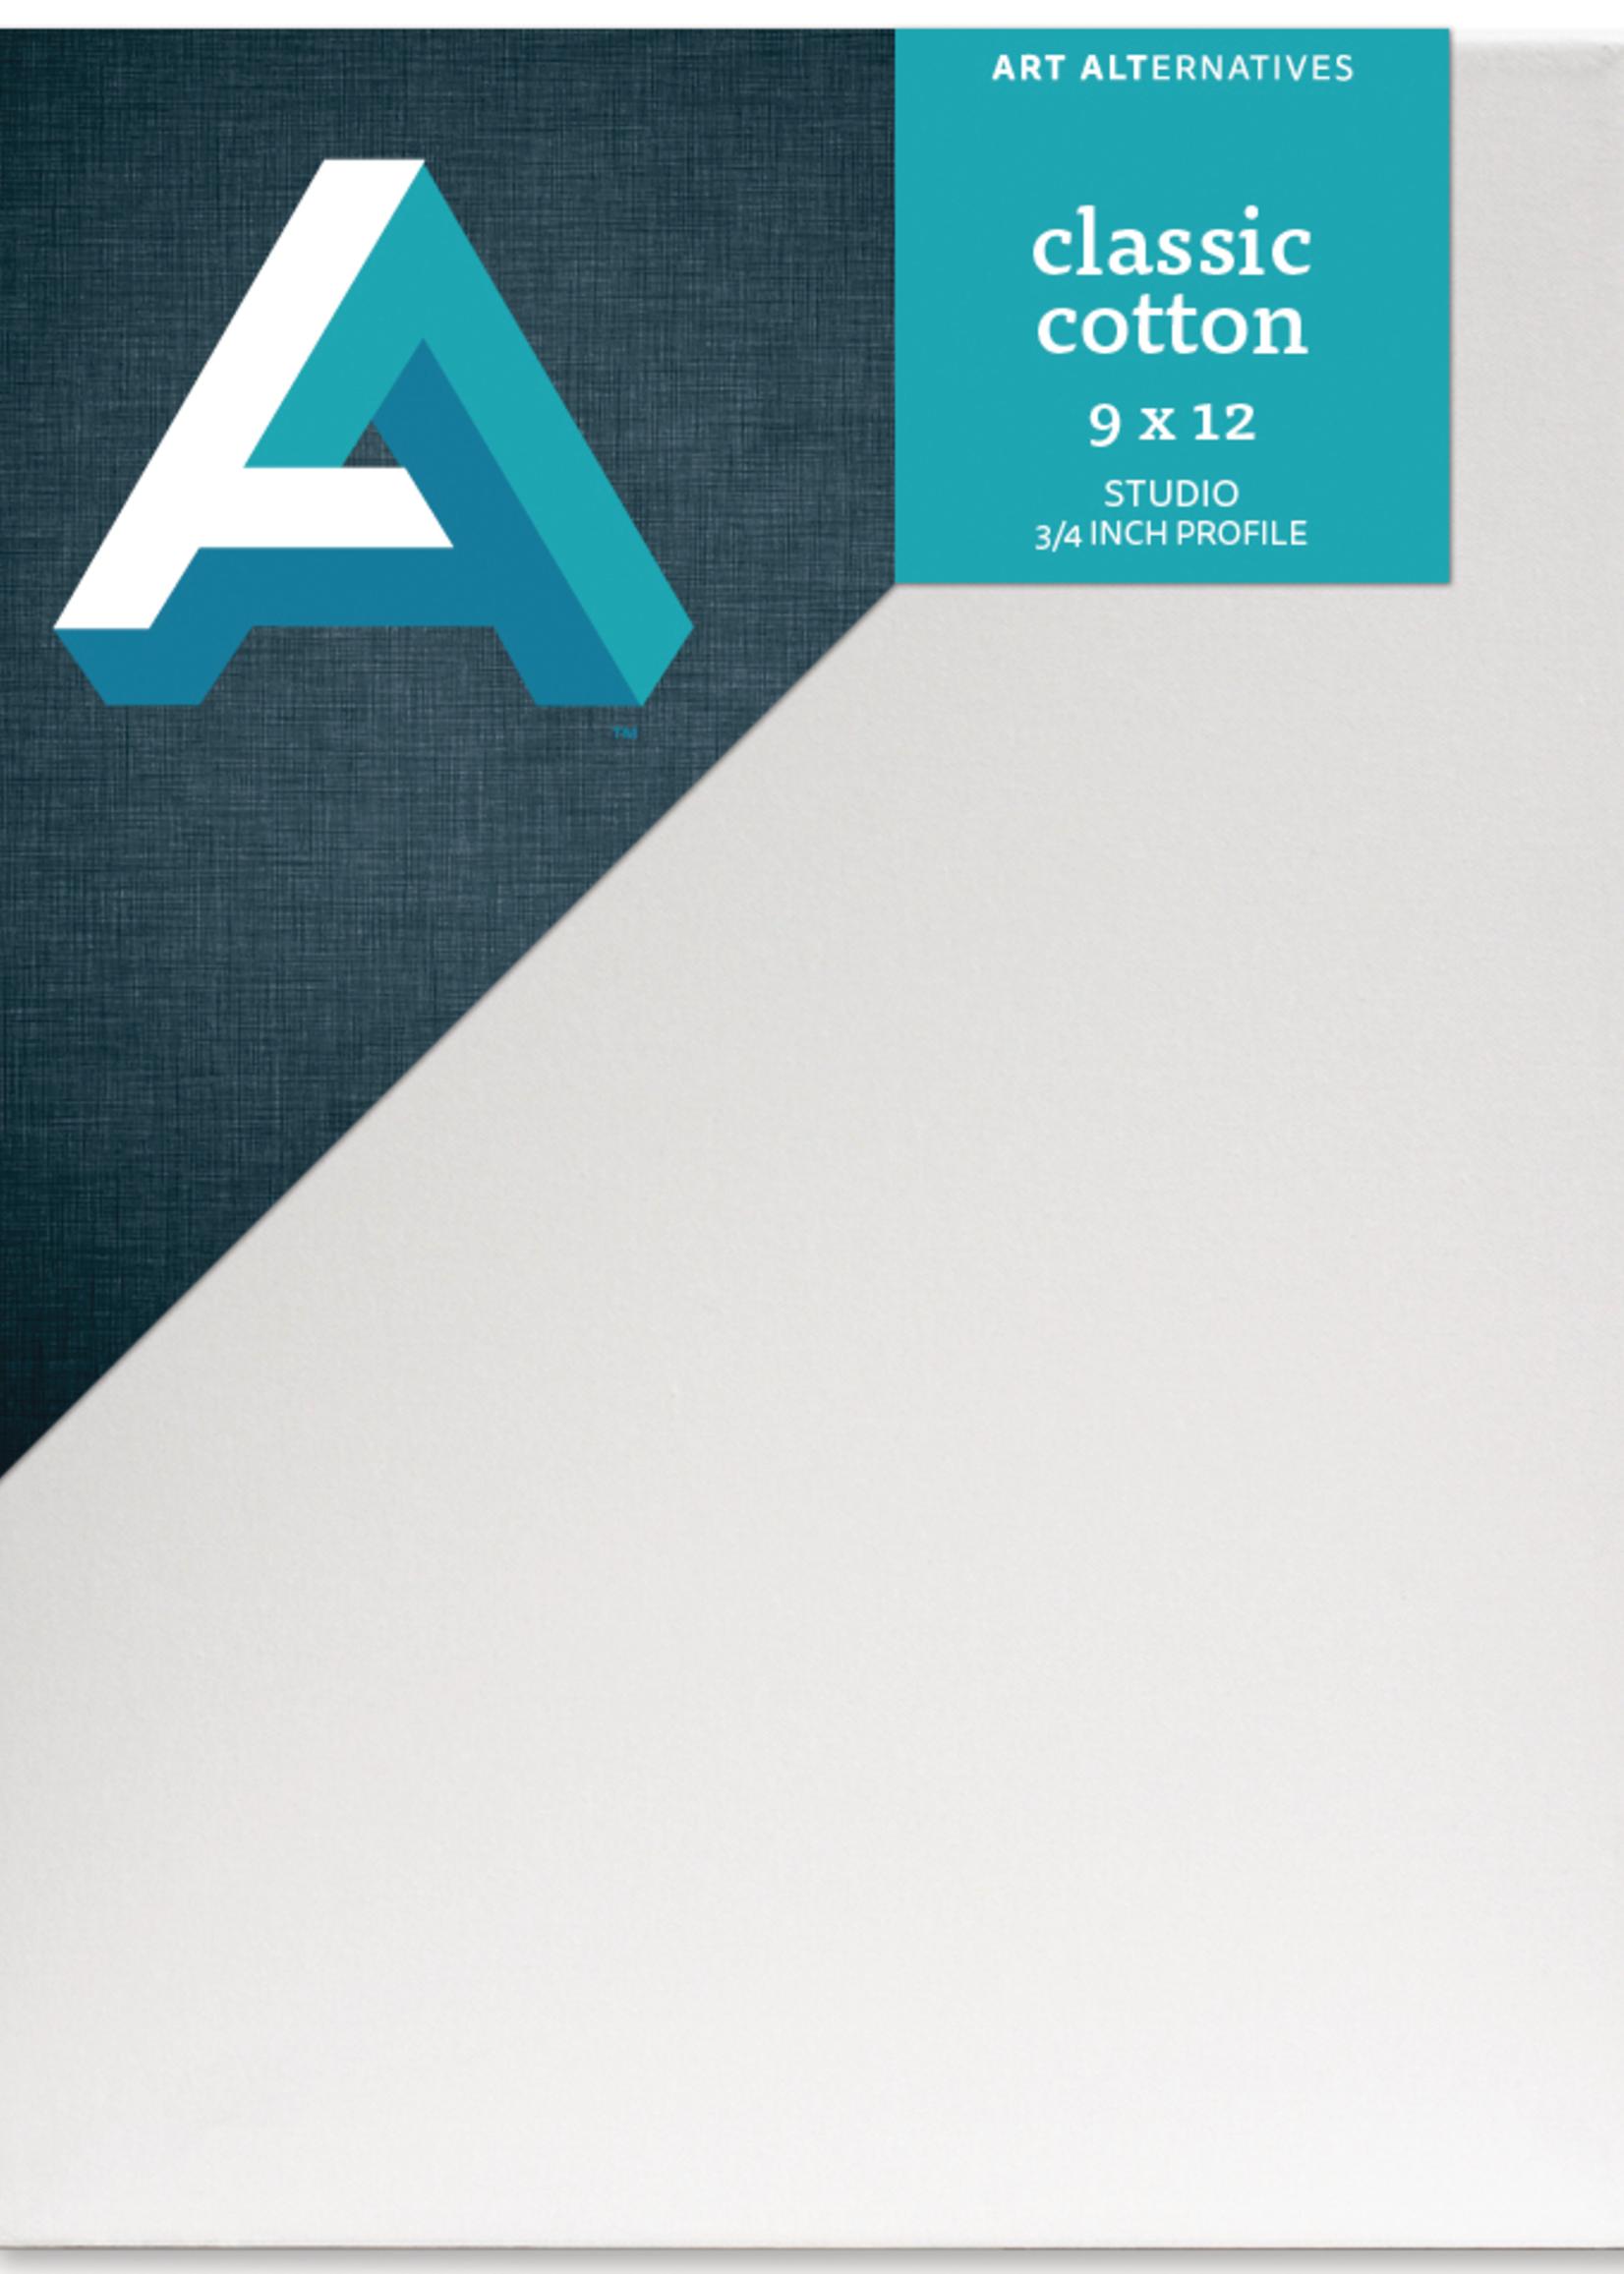 ART ALTERNATIVES AA- CANVAS CLASSIC STUDIO/GALLERY